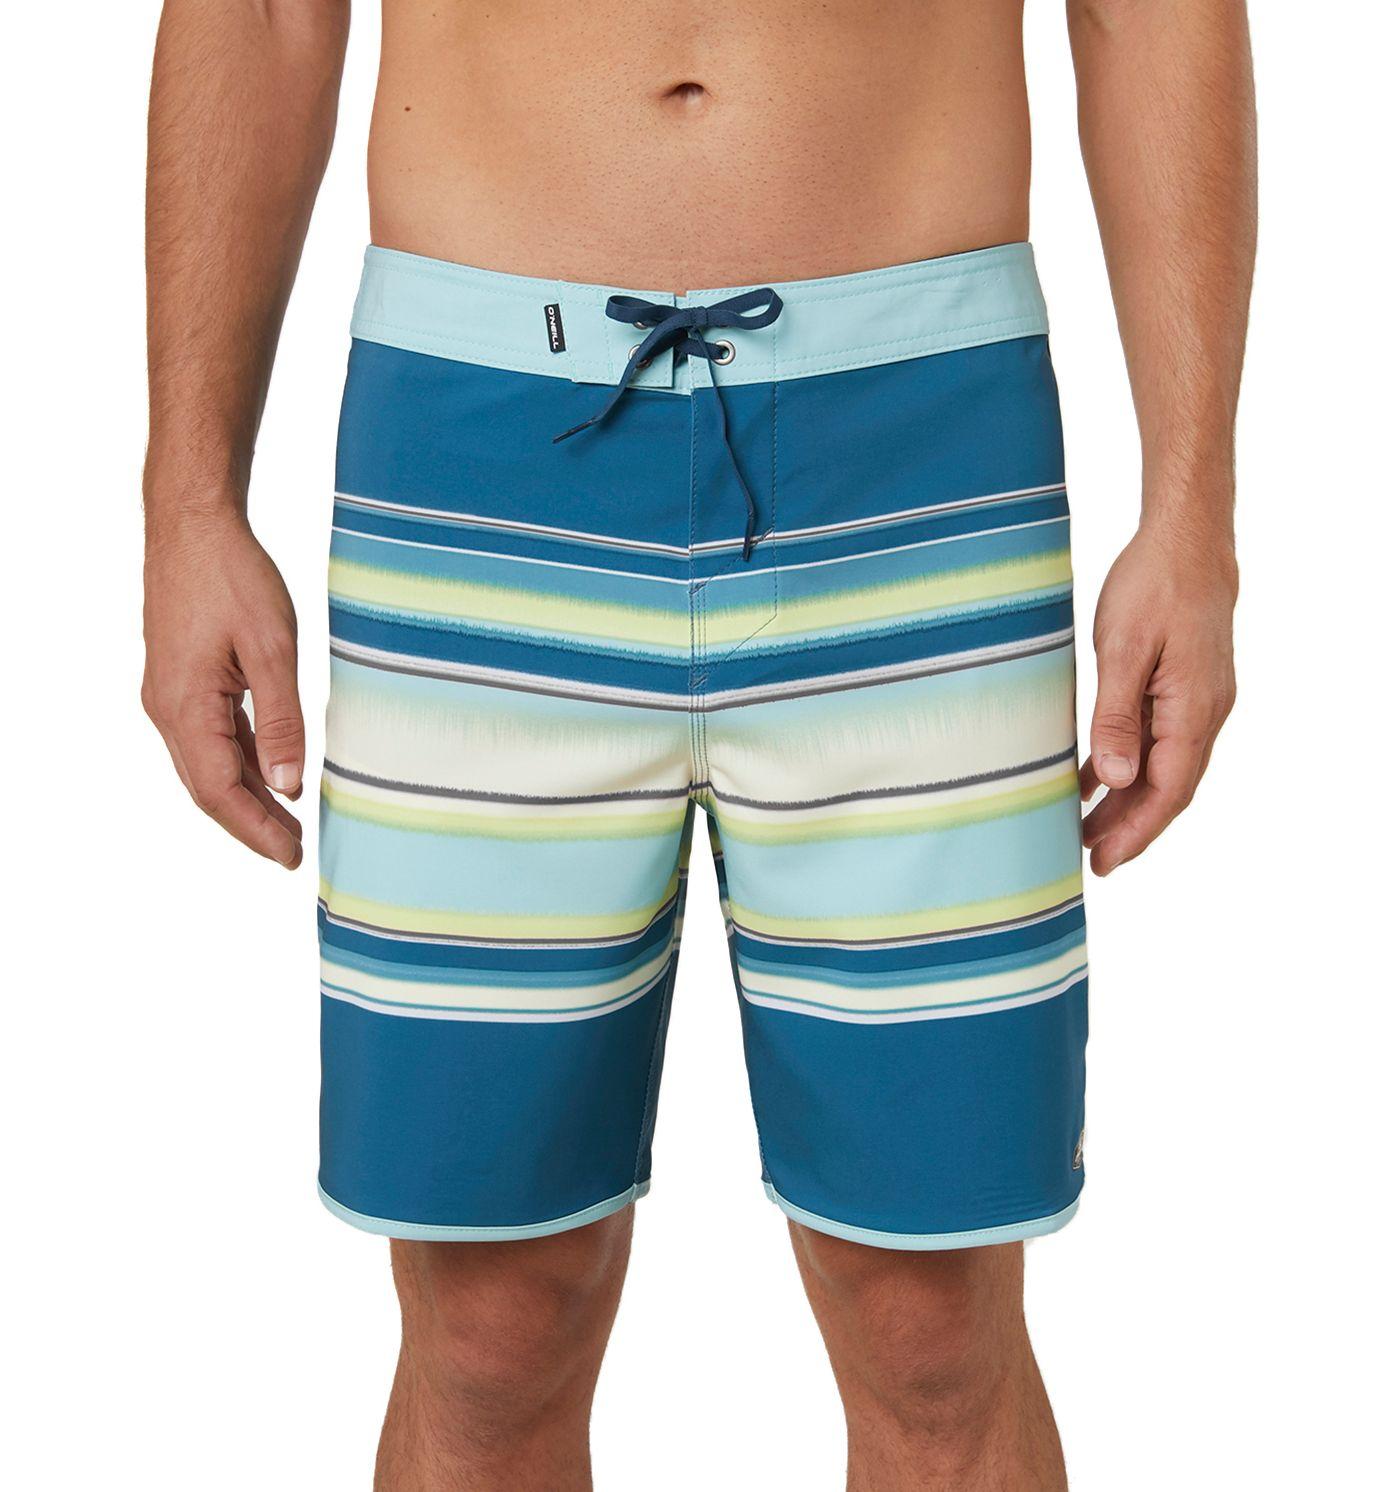 O'Neill Men's Hyperfreak Lined Up Board Shorts